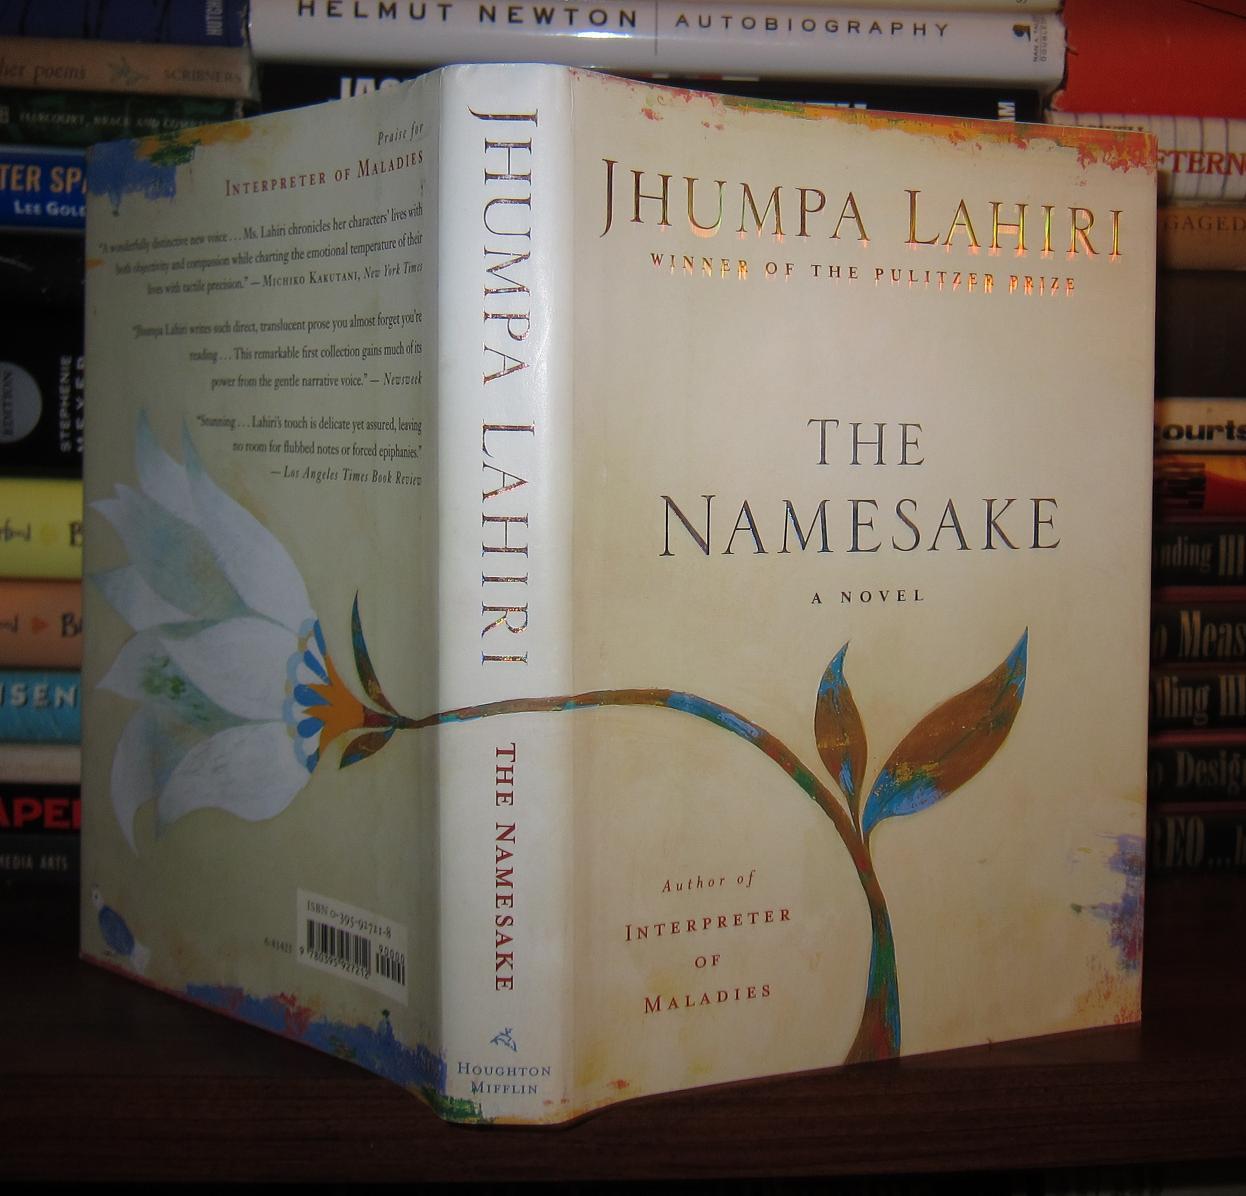 Image result for book cover of the namesake by jhumpa lahiri